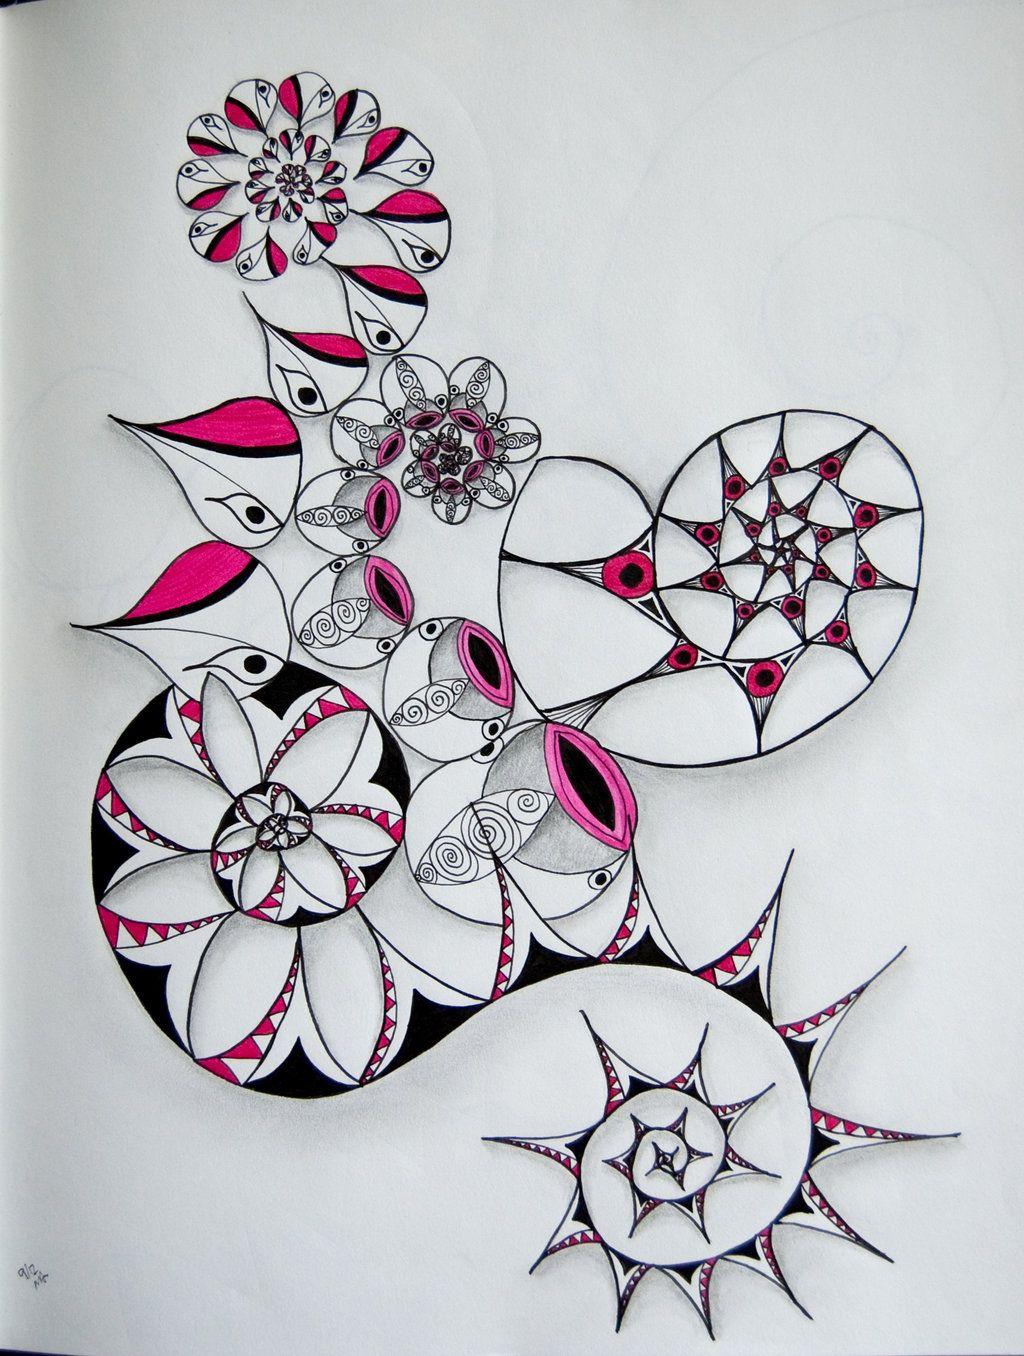 Spiral Patterns by orion10405.deviantart.com on @deviantART